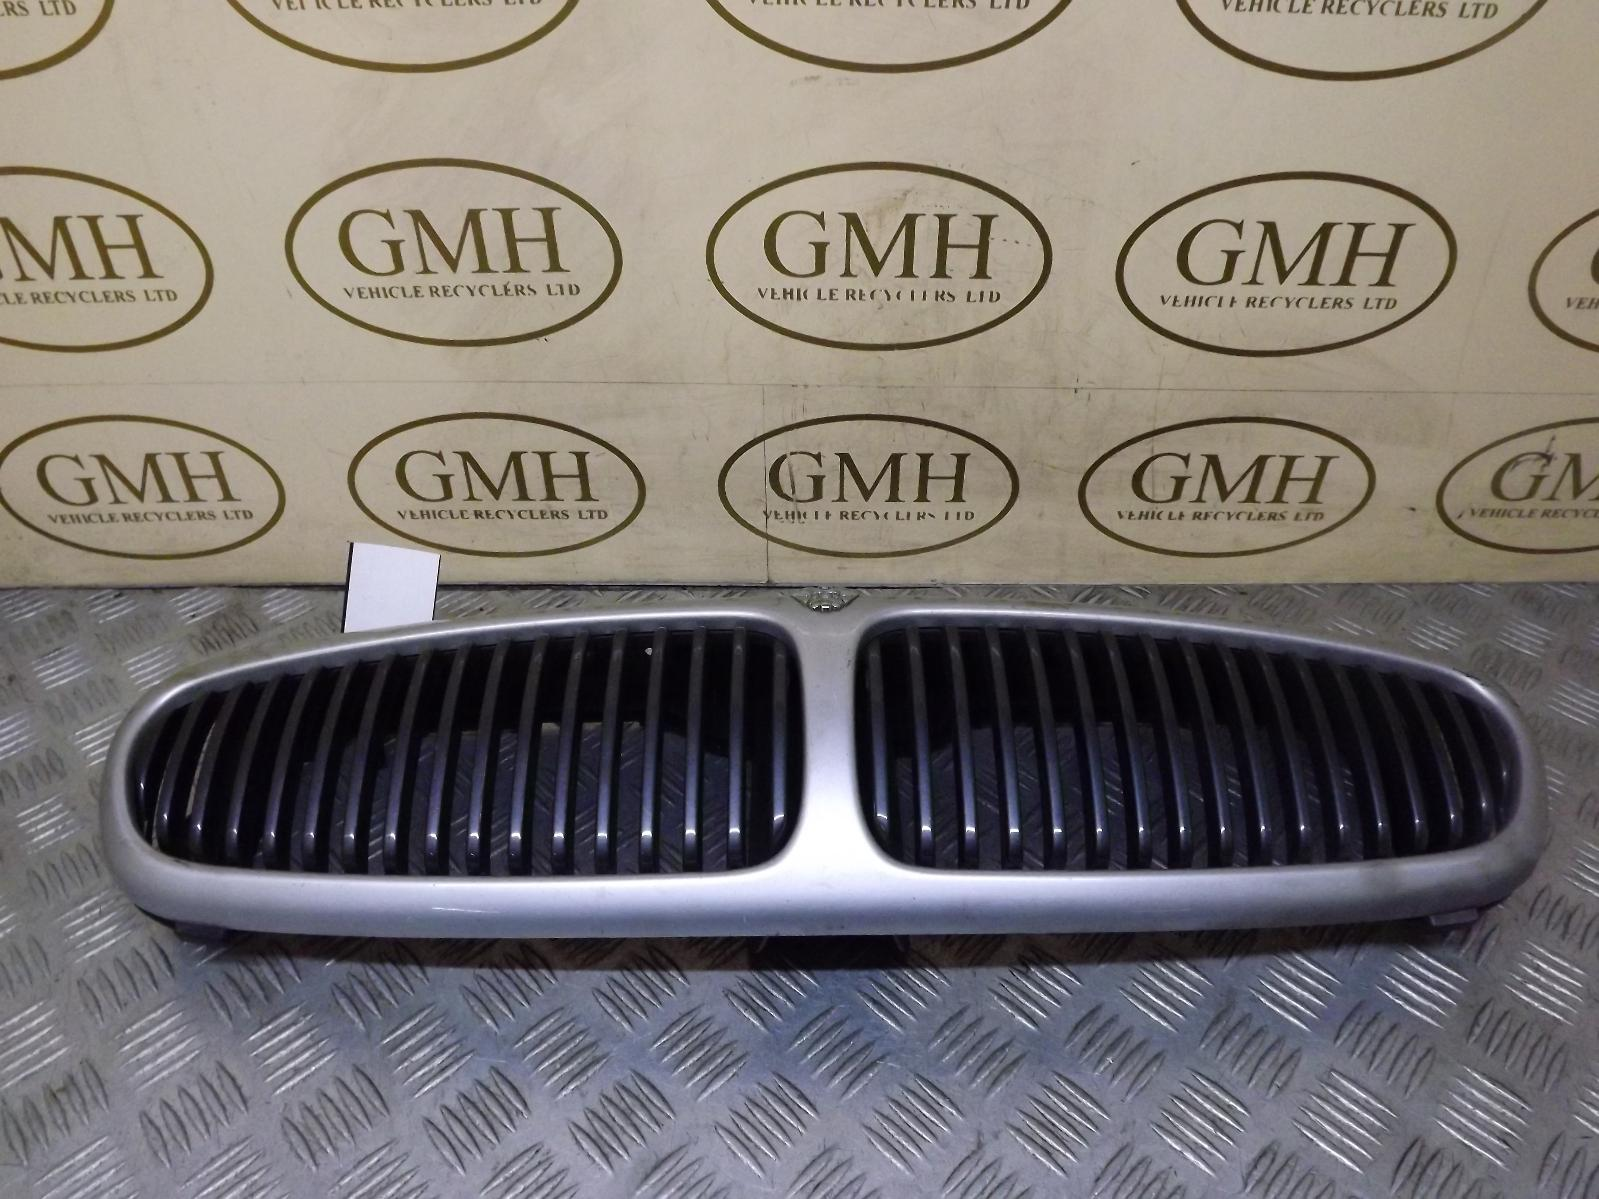 Gmh Car Parts Co Uk